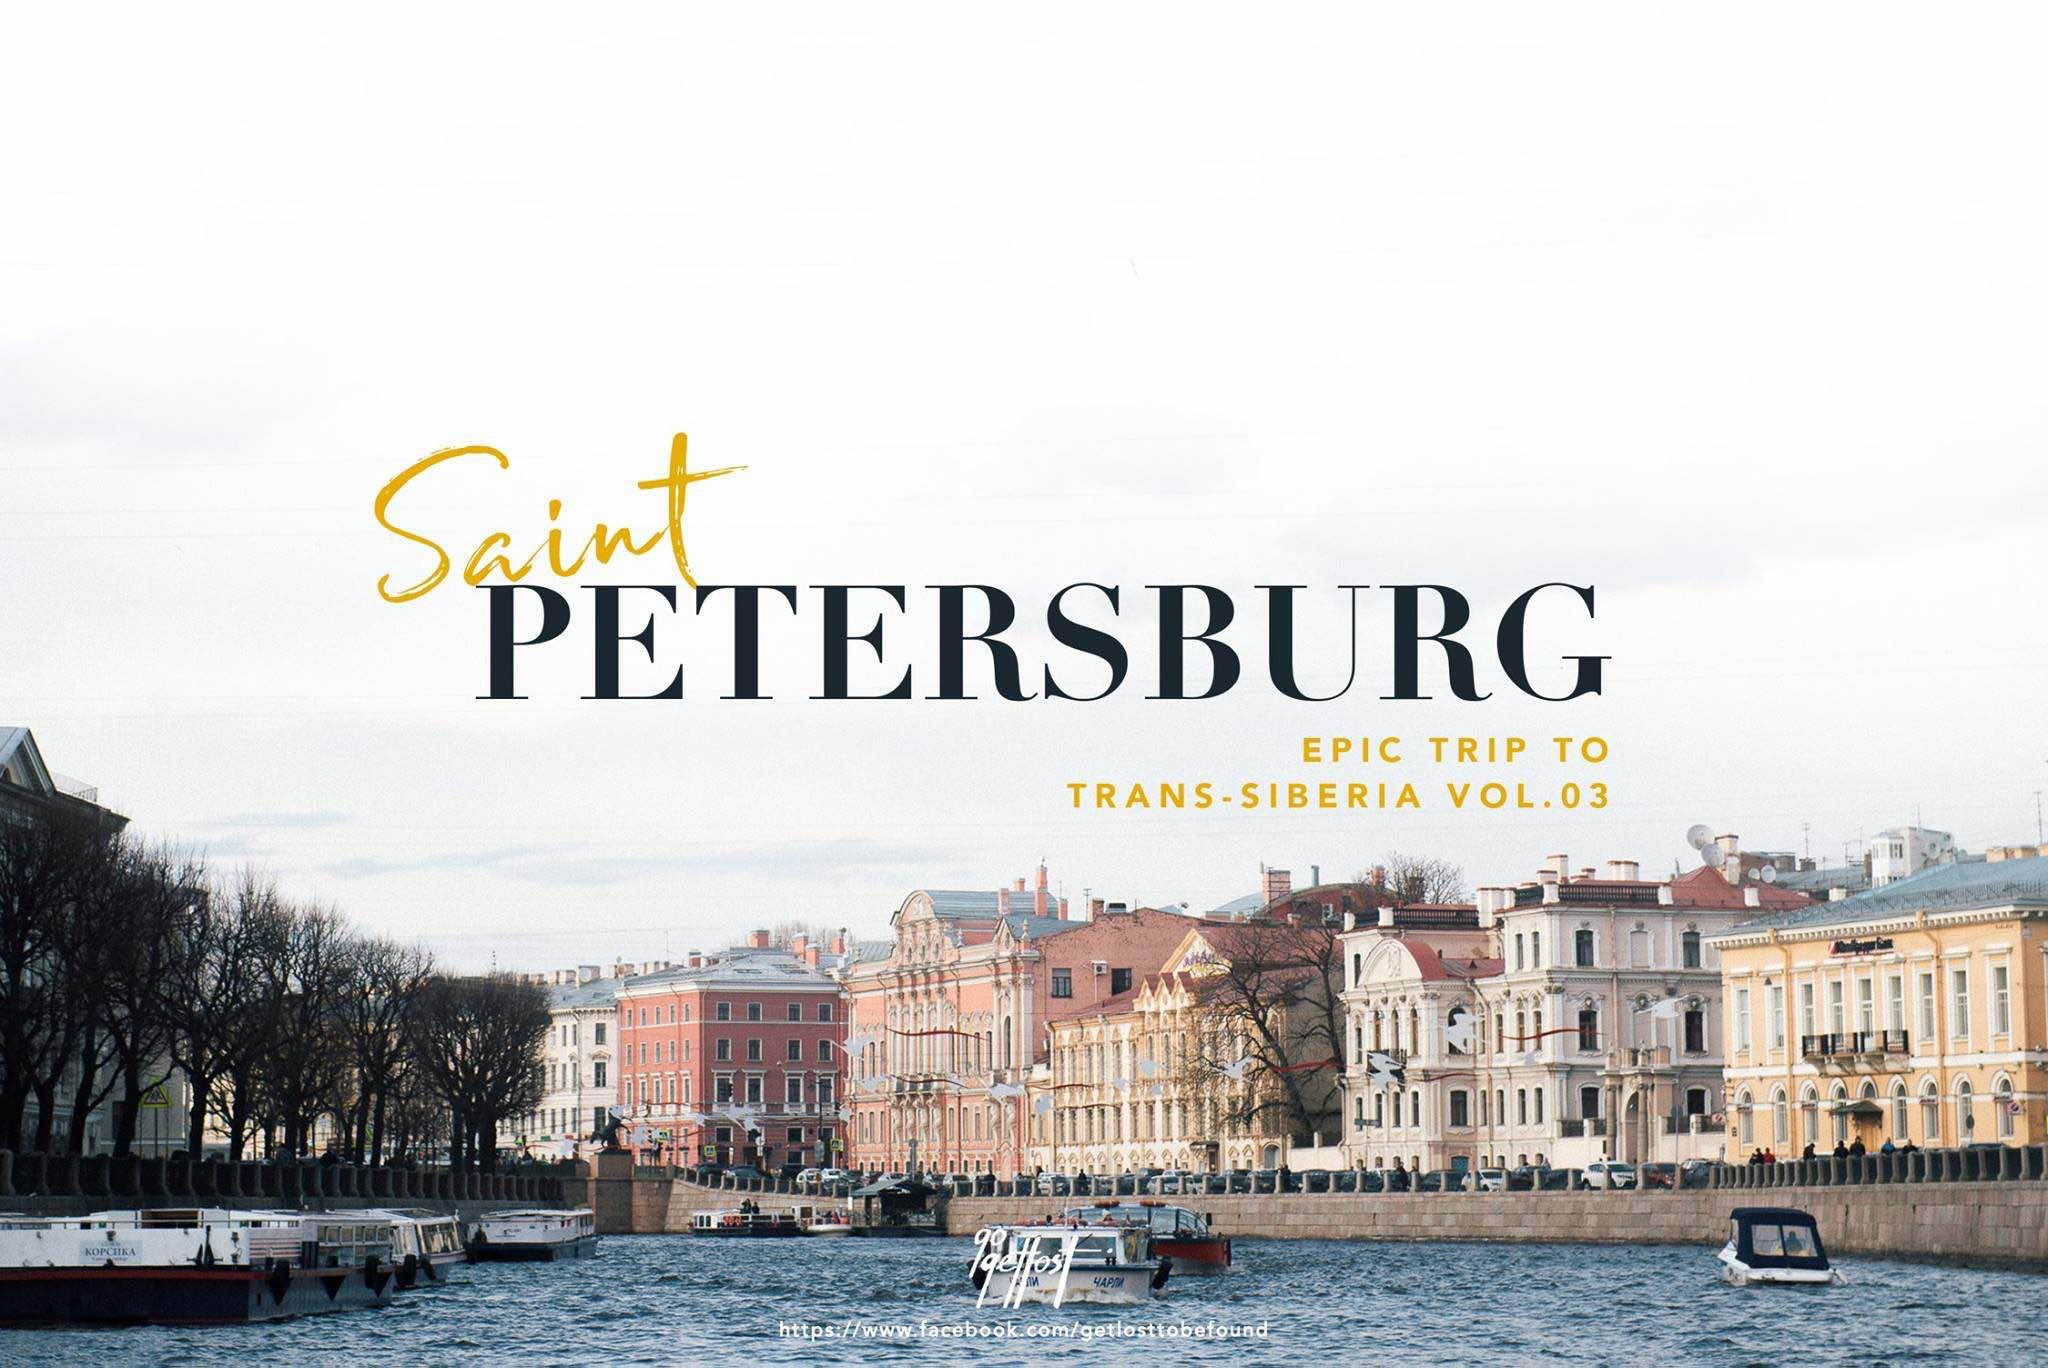 St. Petersburg อดีตเมืองหลวงที่ยิ่งใหญ่และน่าค้นหาของประเทศรัสเซีย